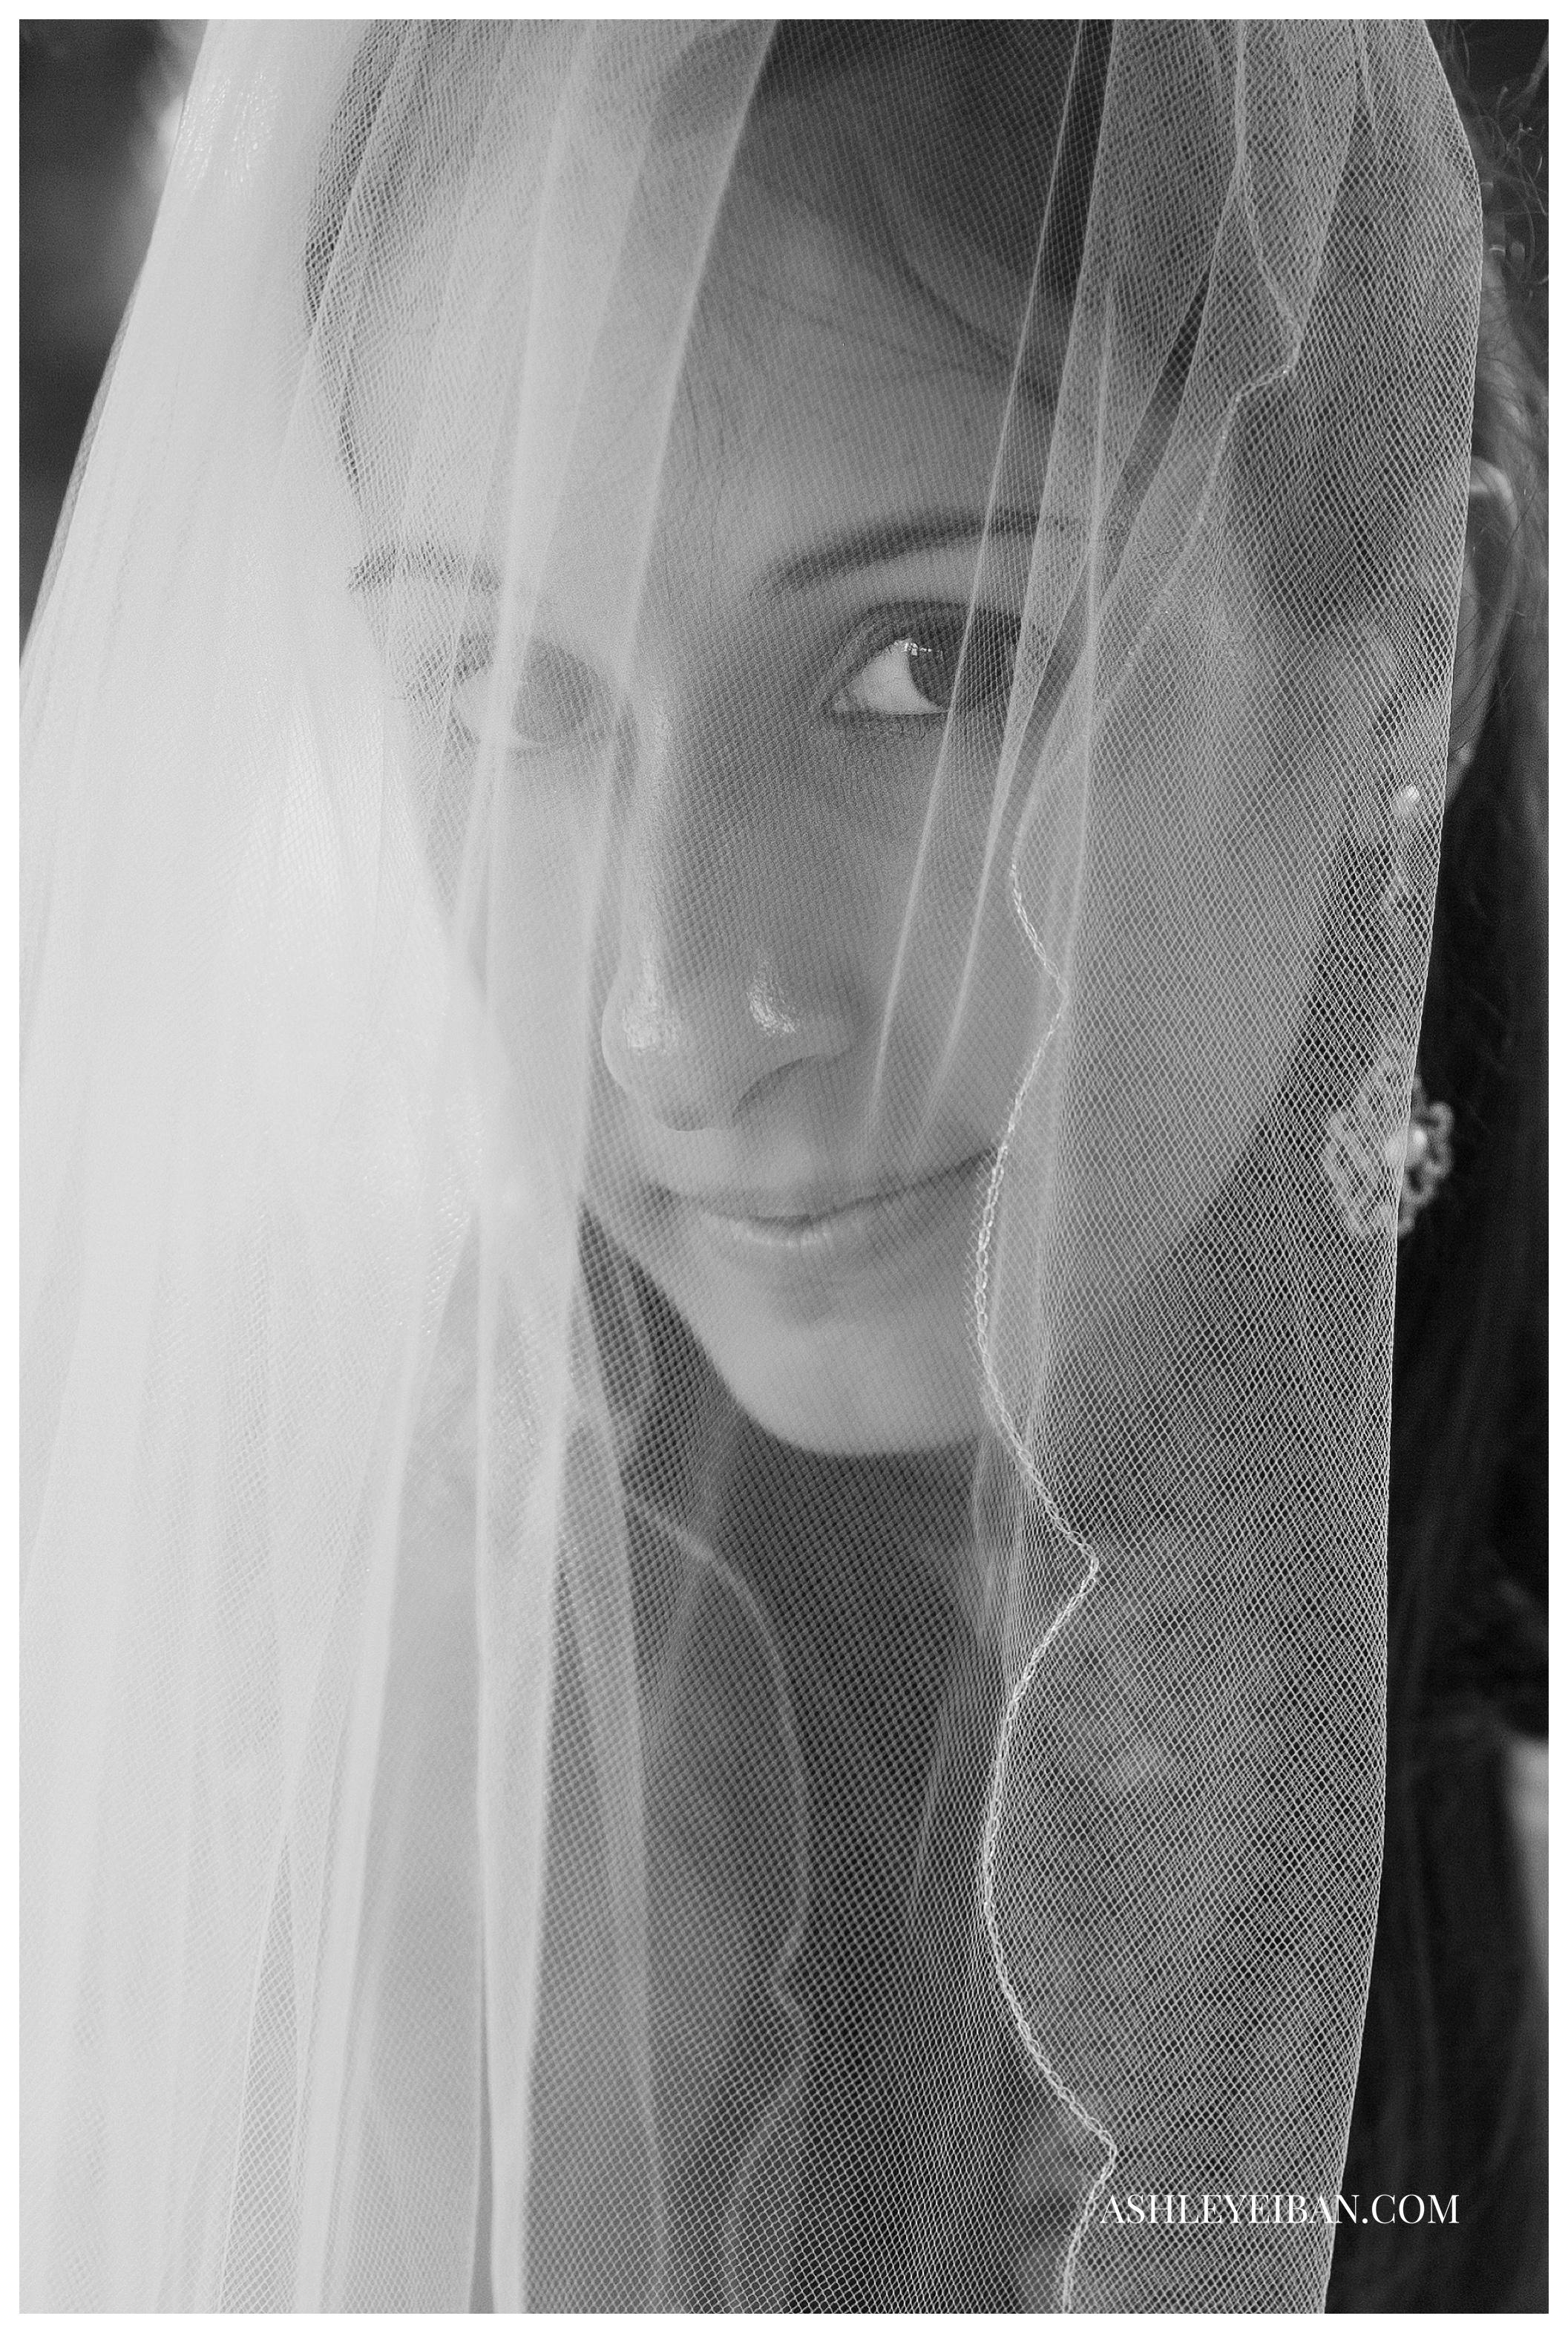 Lynchburg Virginia Wedding Photographer || Ashley Eiban Photography || www.ashleyeiban.com || Lynchburg Virginia Bridal Portraits